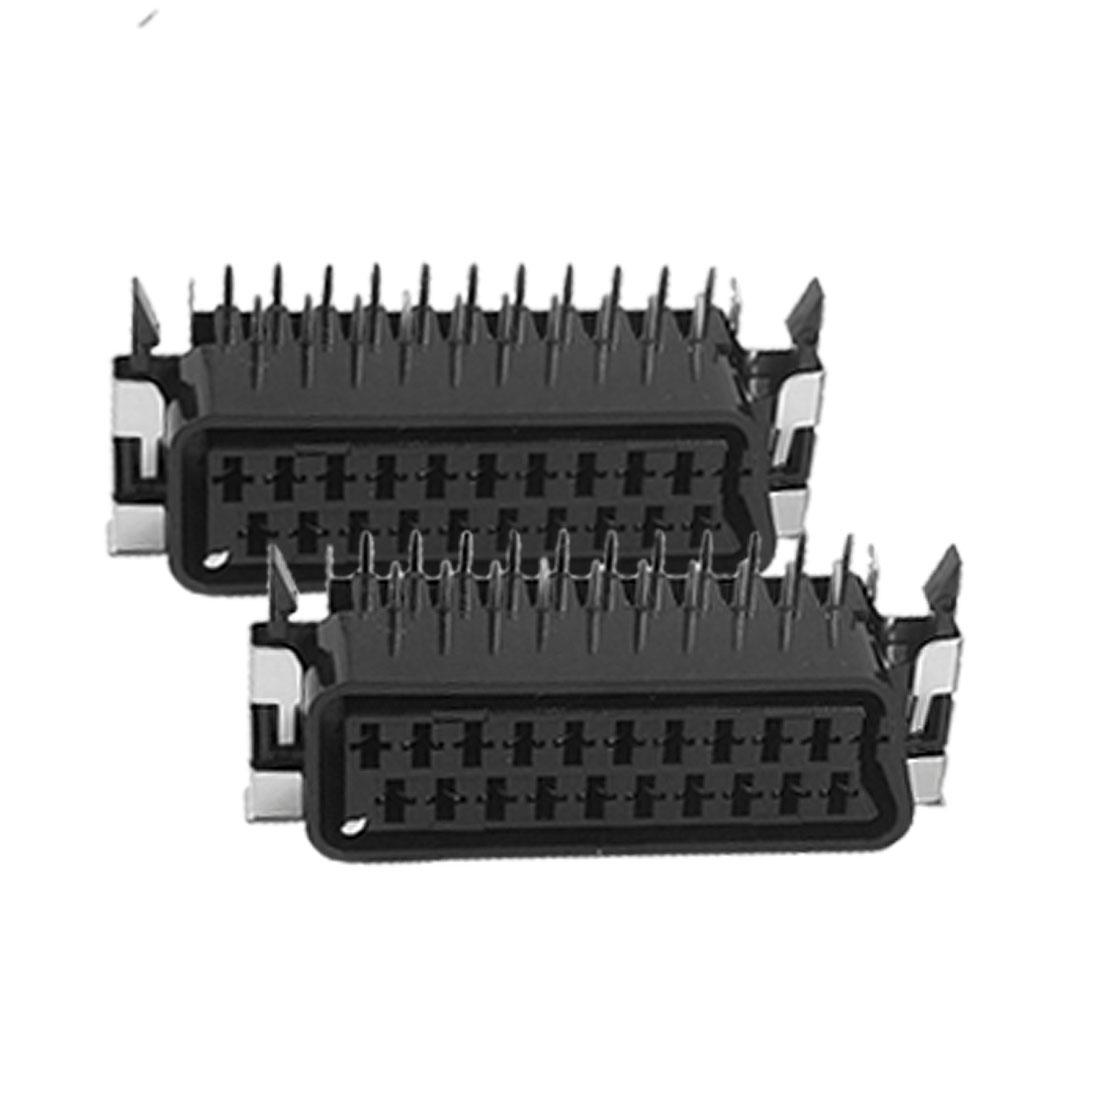 2 Pcs 21 Pins Vertical Type Scart Jack Socket Connector